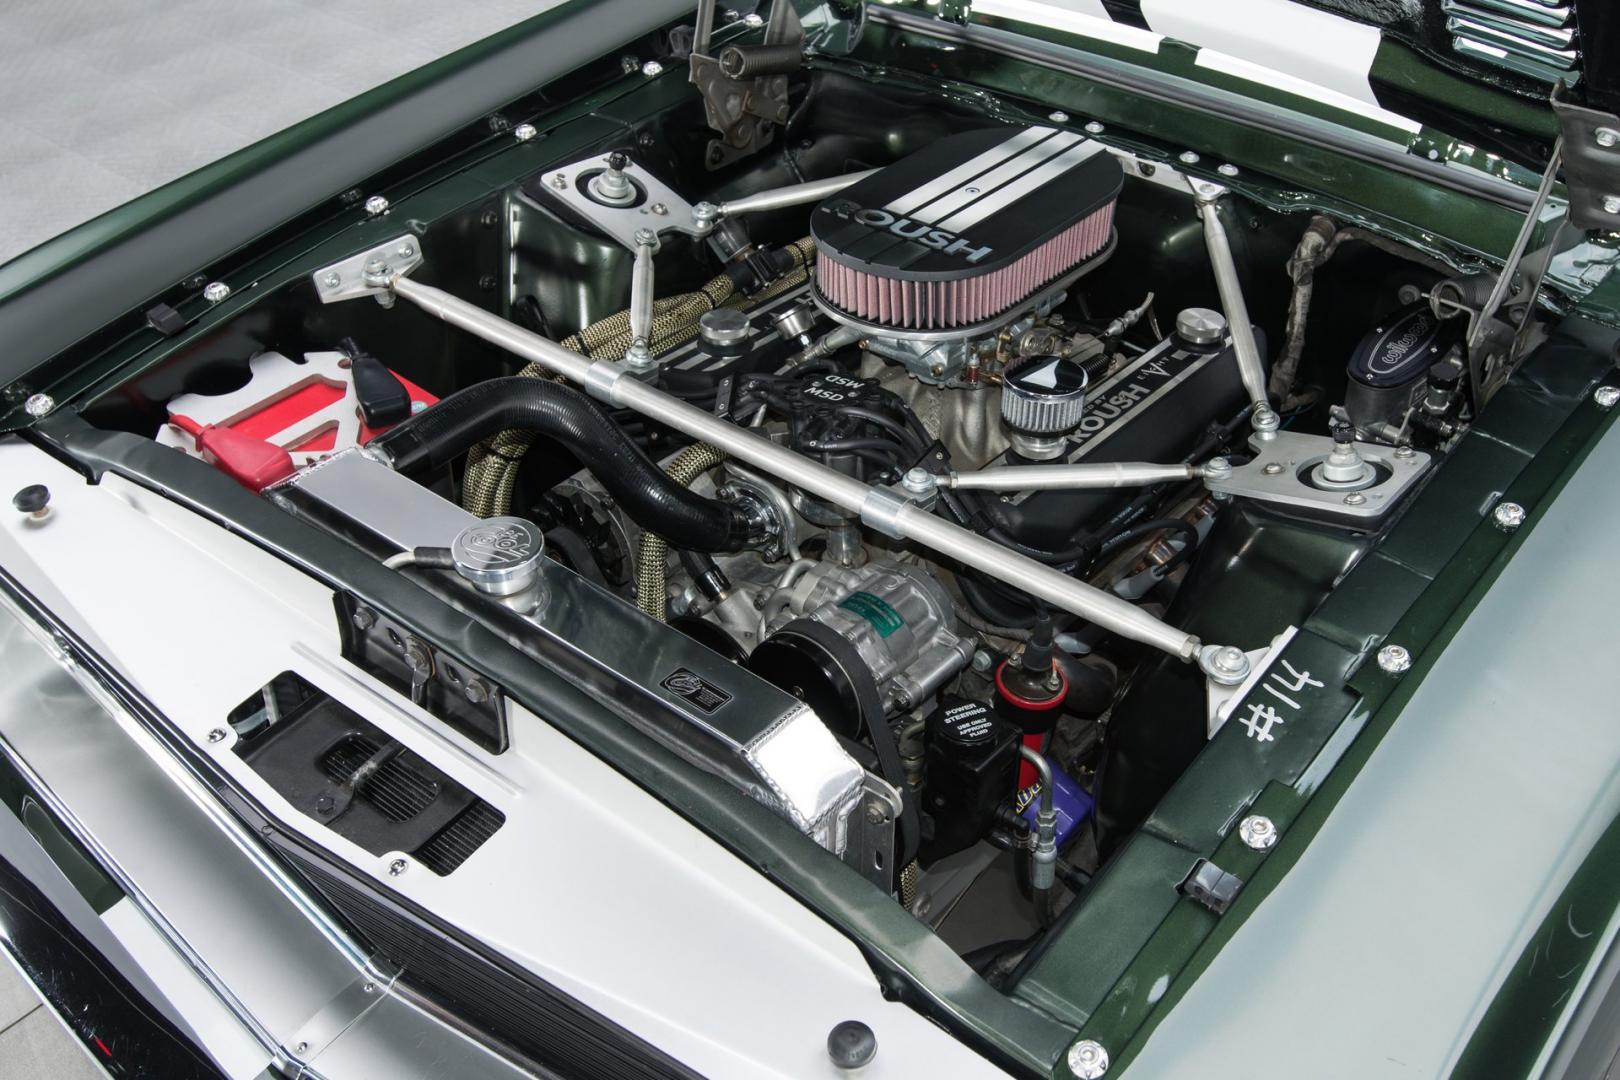 Ford Mustang Tokyo Drift motor